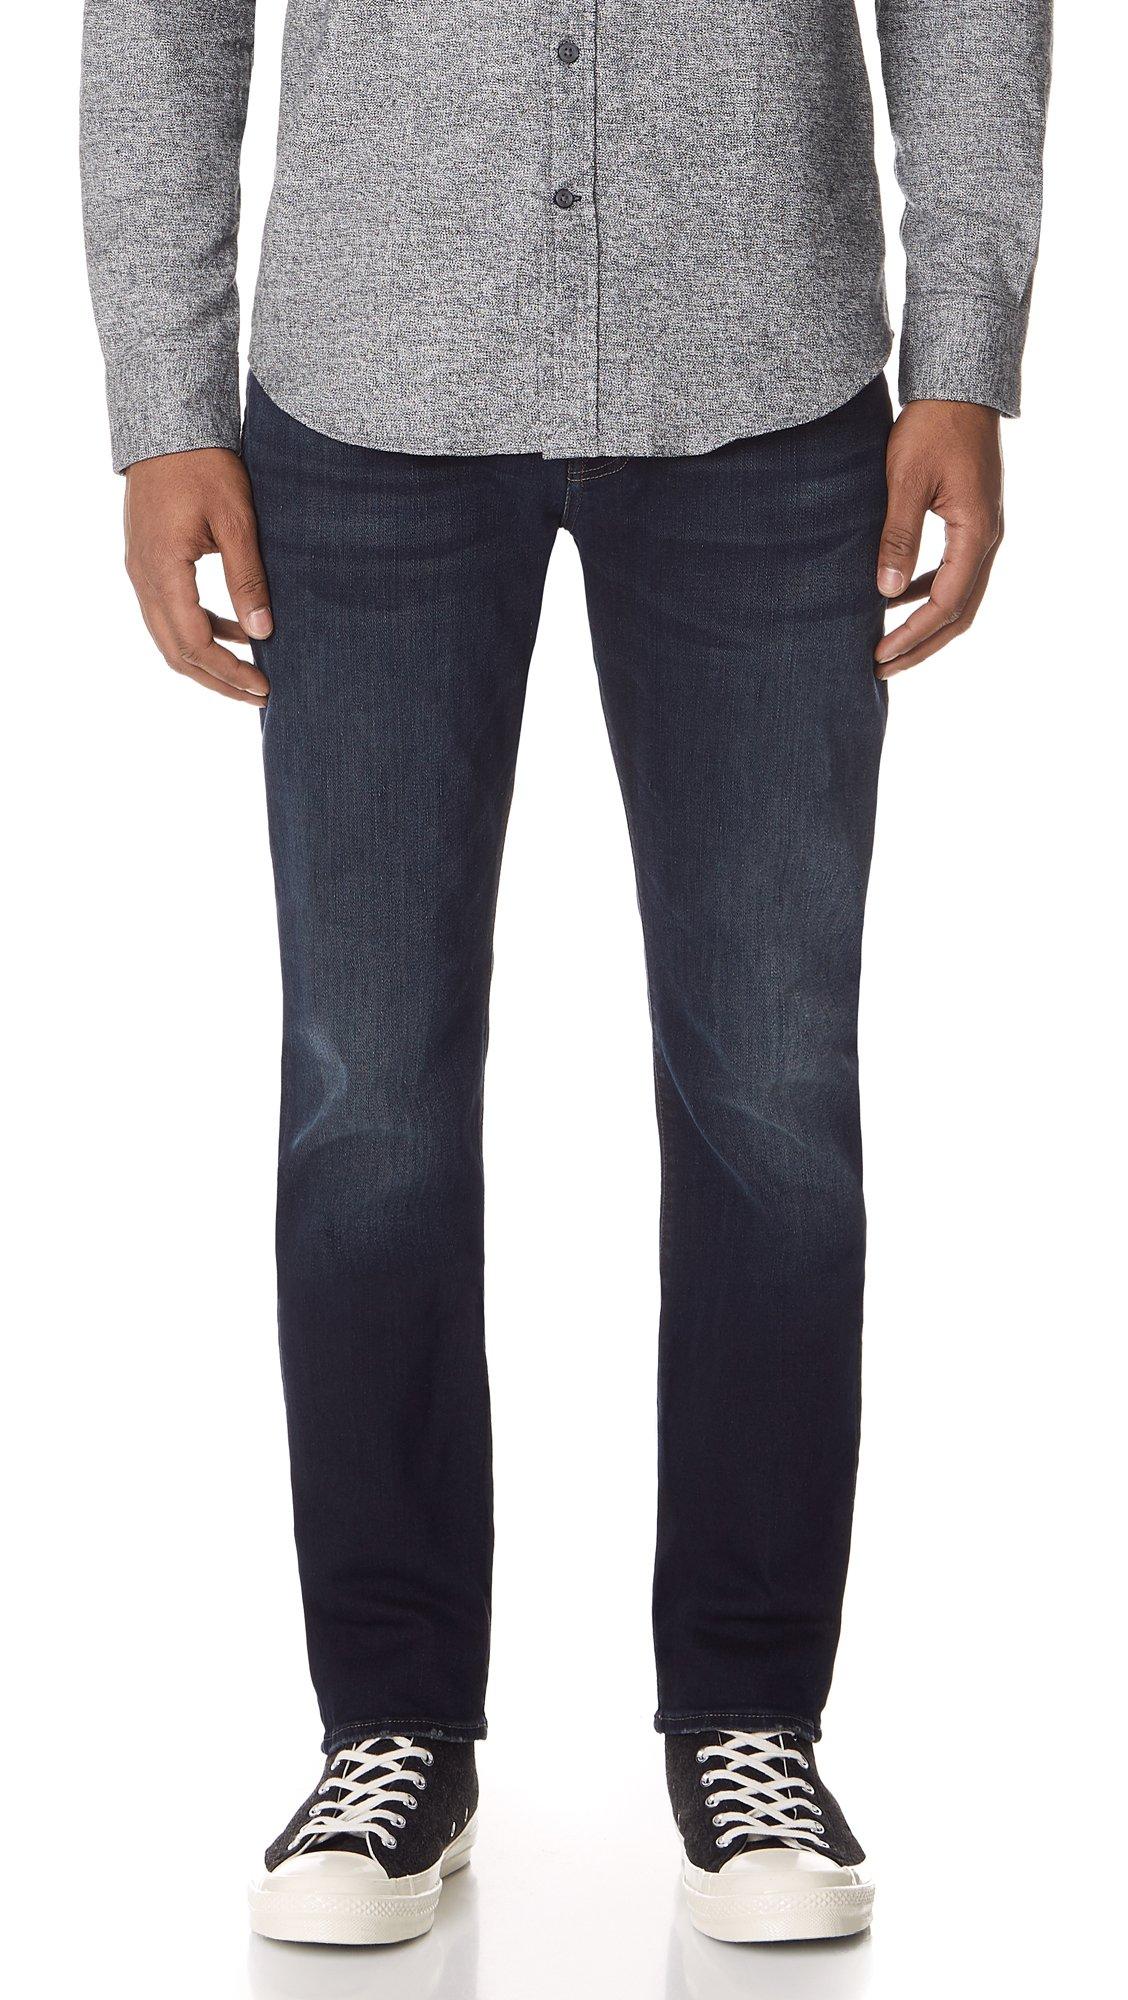 7 For All Mankind Men's Straight Leg Jeans